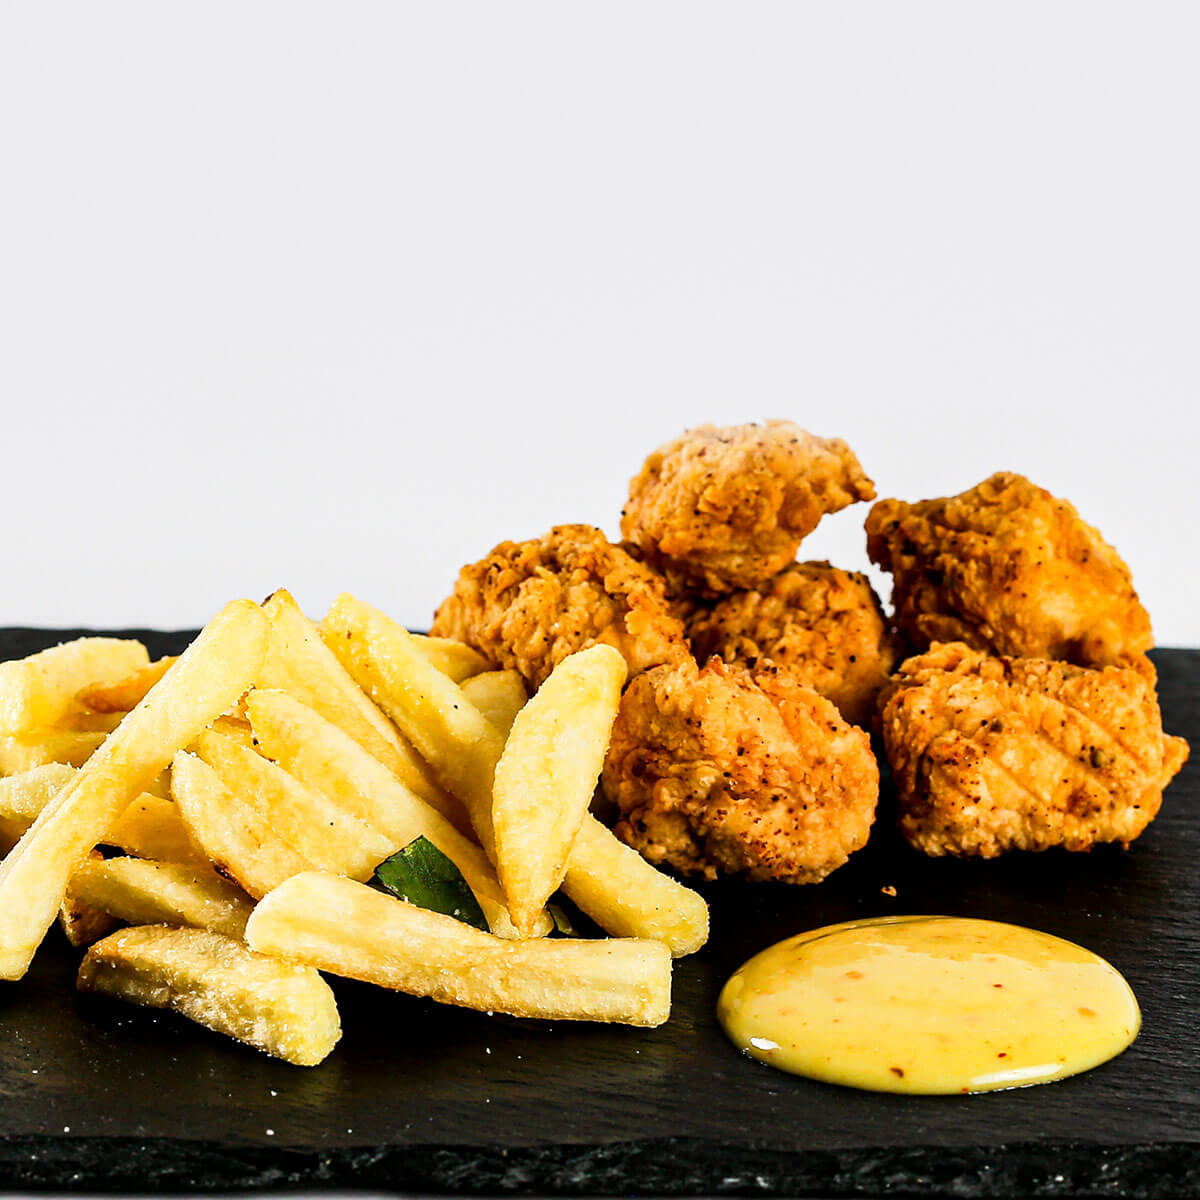 Best fast food restaurants in Lahore